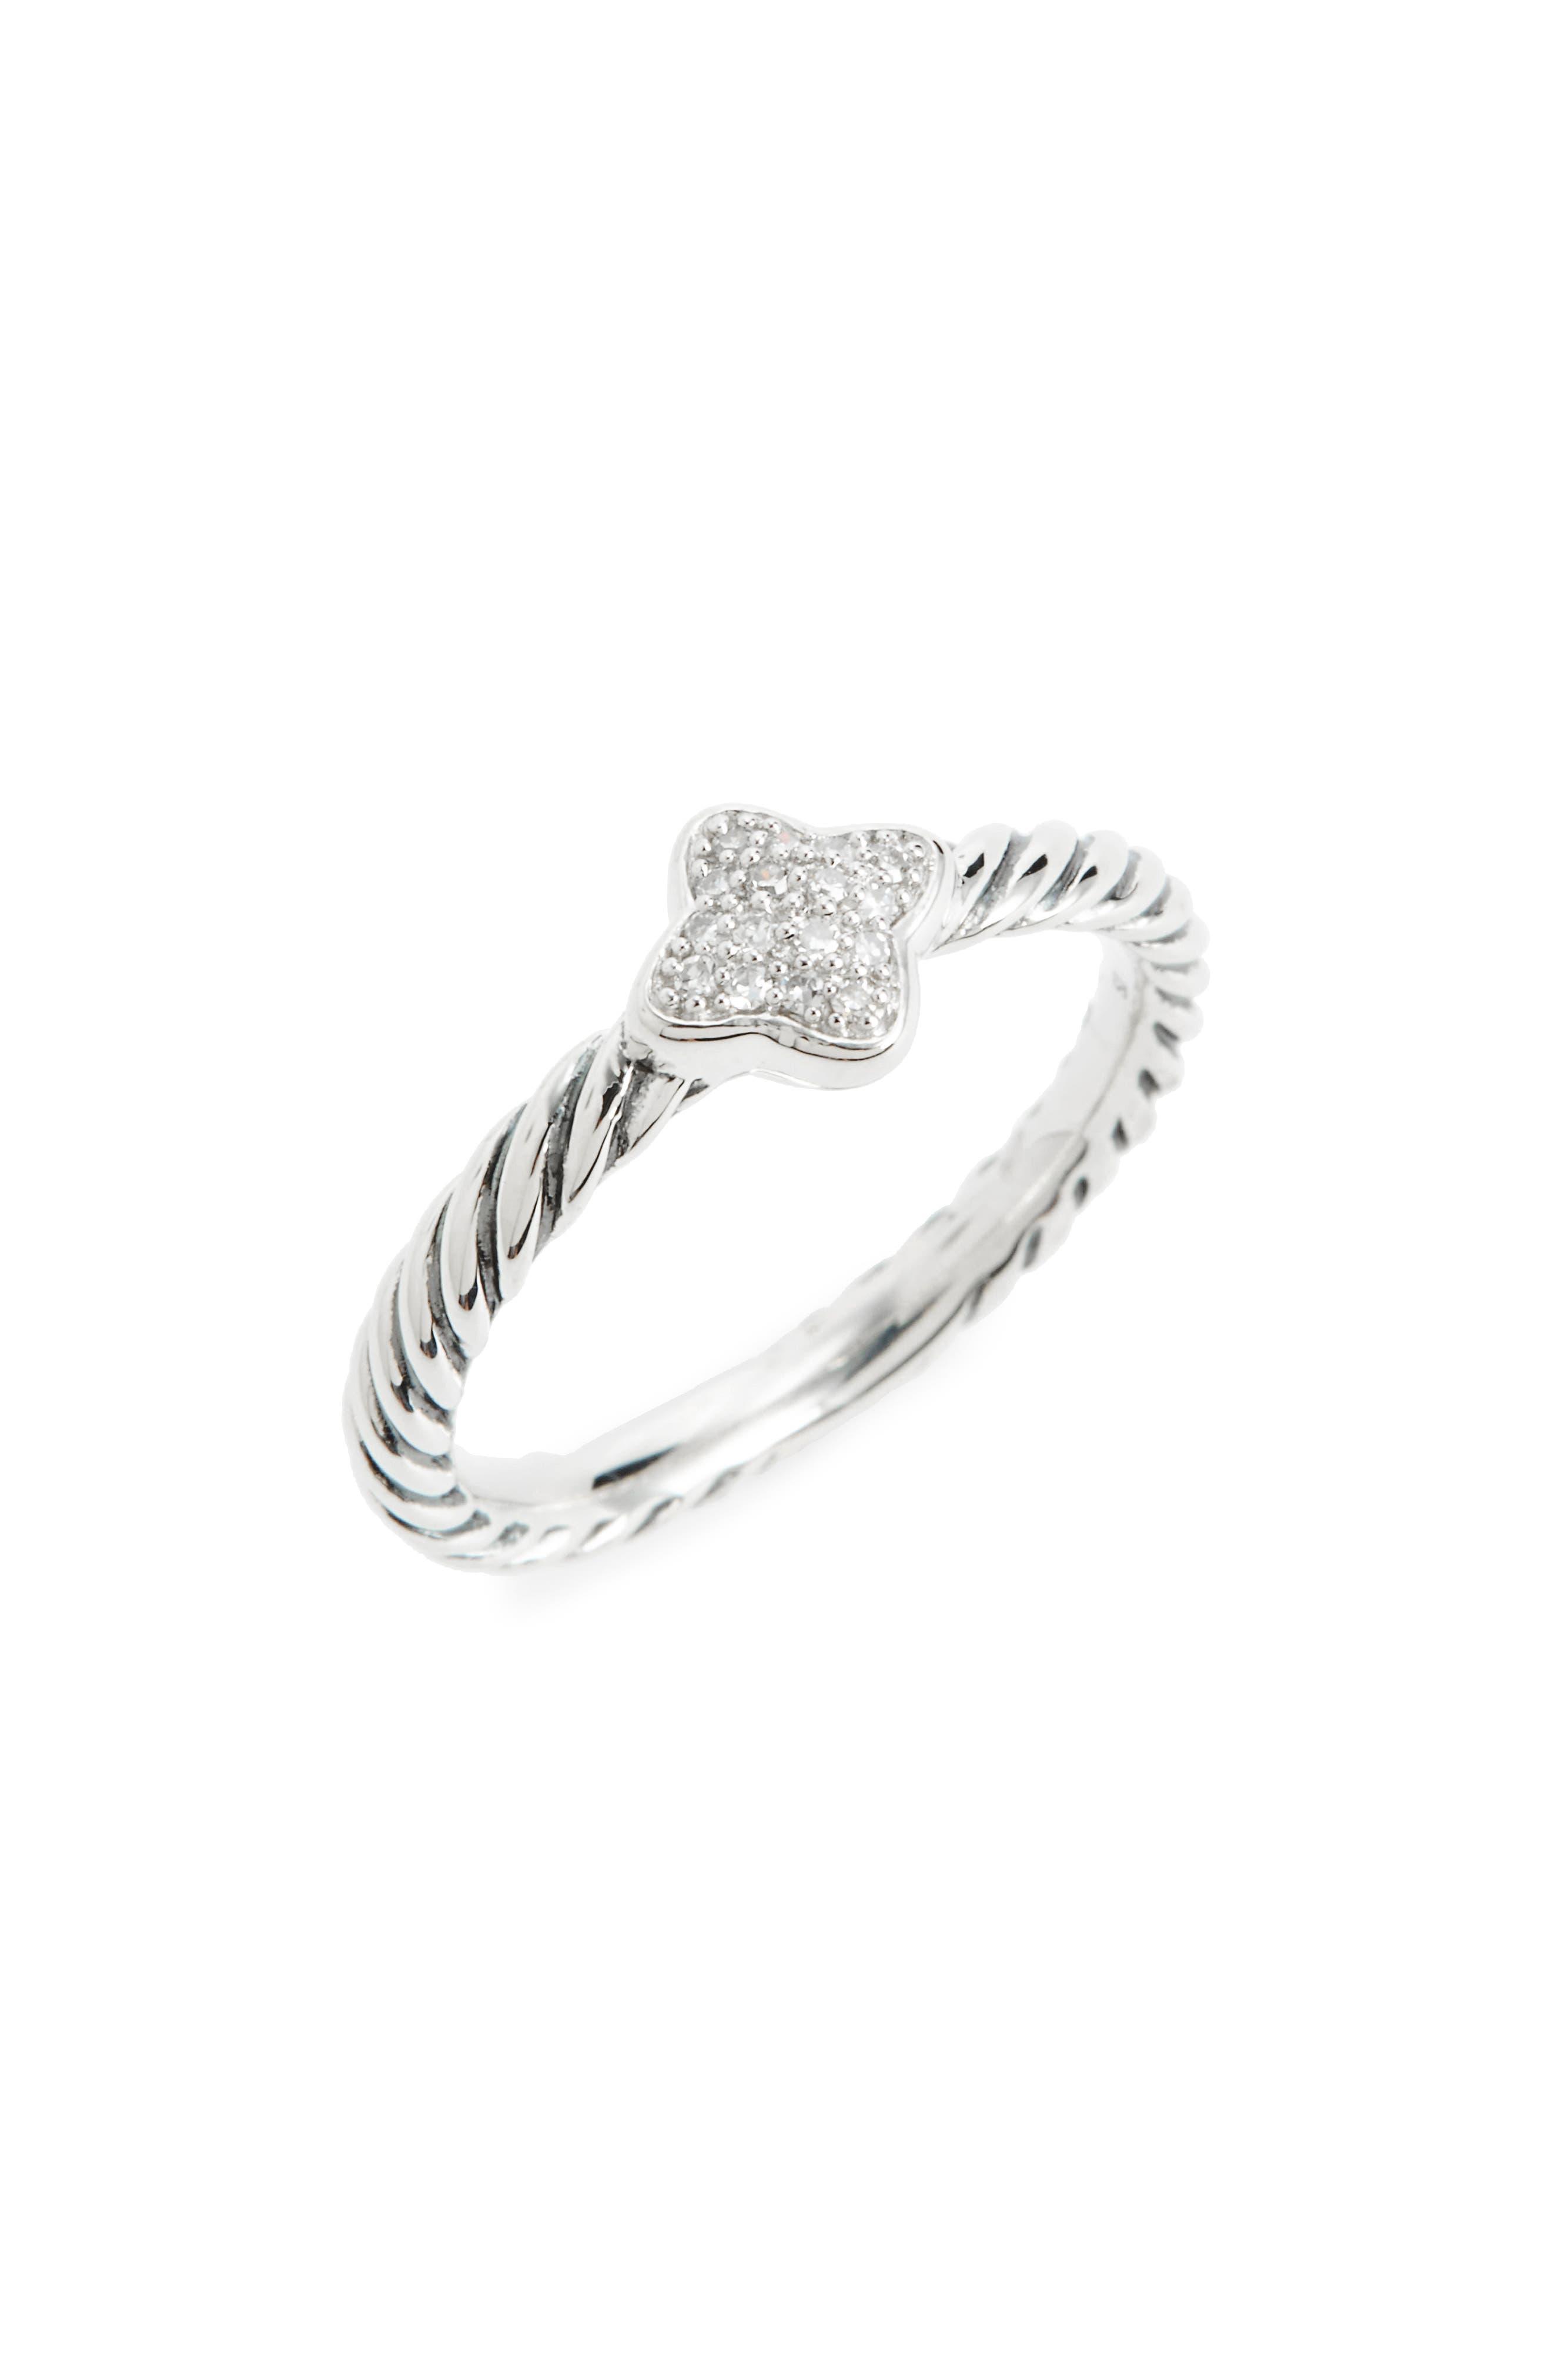 Quatrefoil Ring with Diamonds,                         Main,                         color, 100